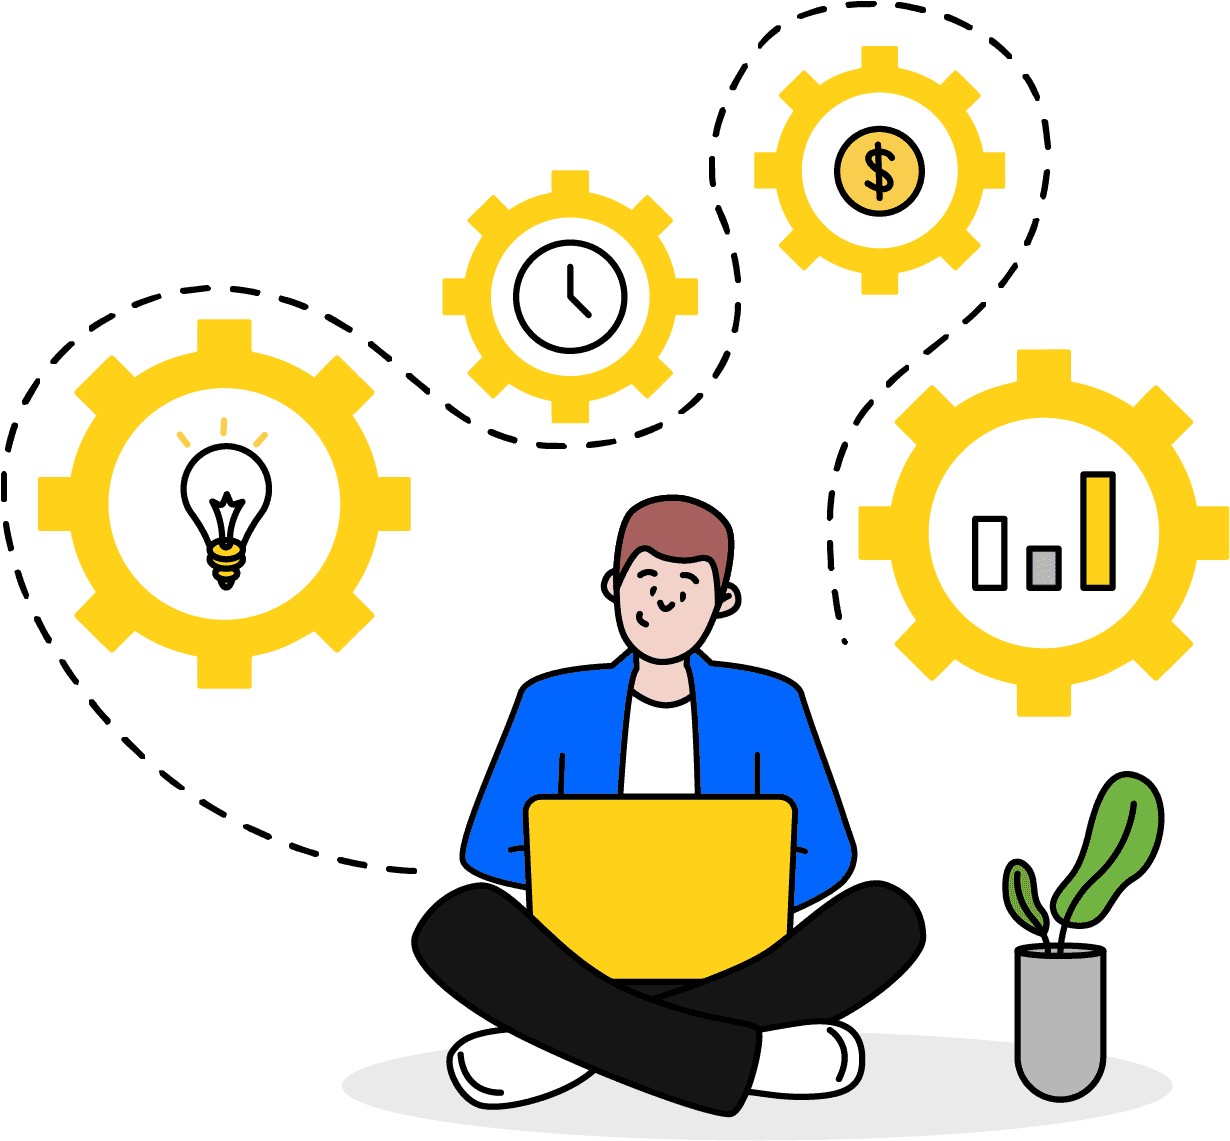 Keoch Website Design and Development